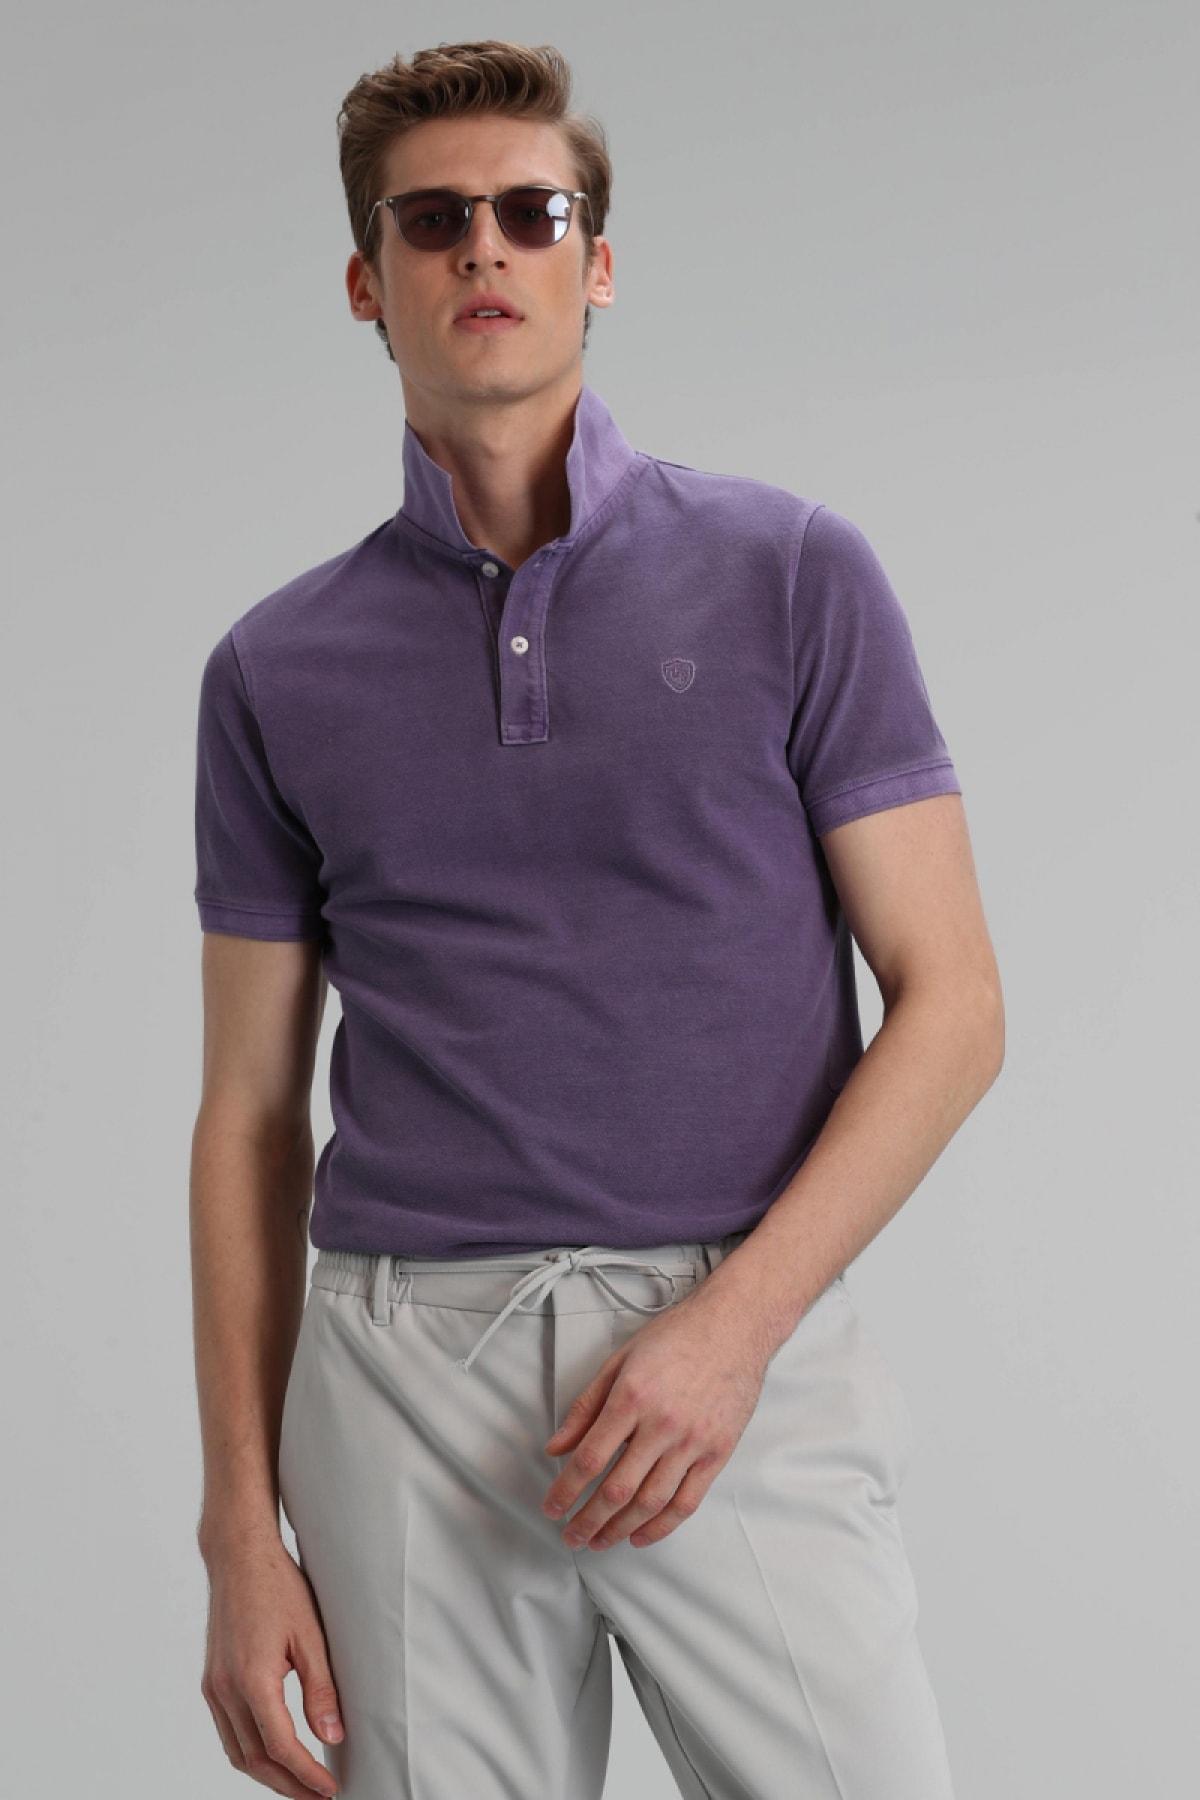 Lufian Erkek Spor Polo T- Shirt